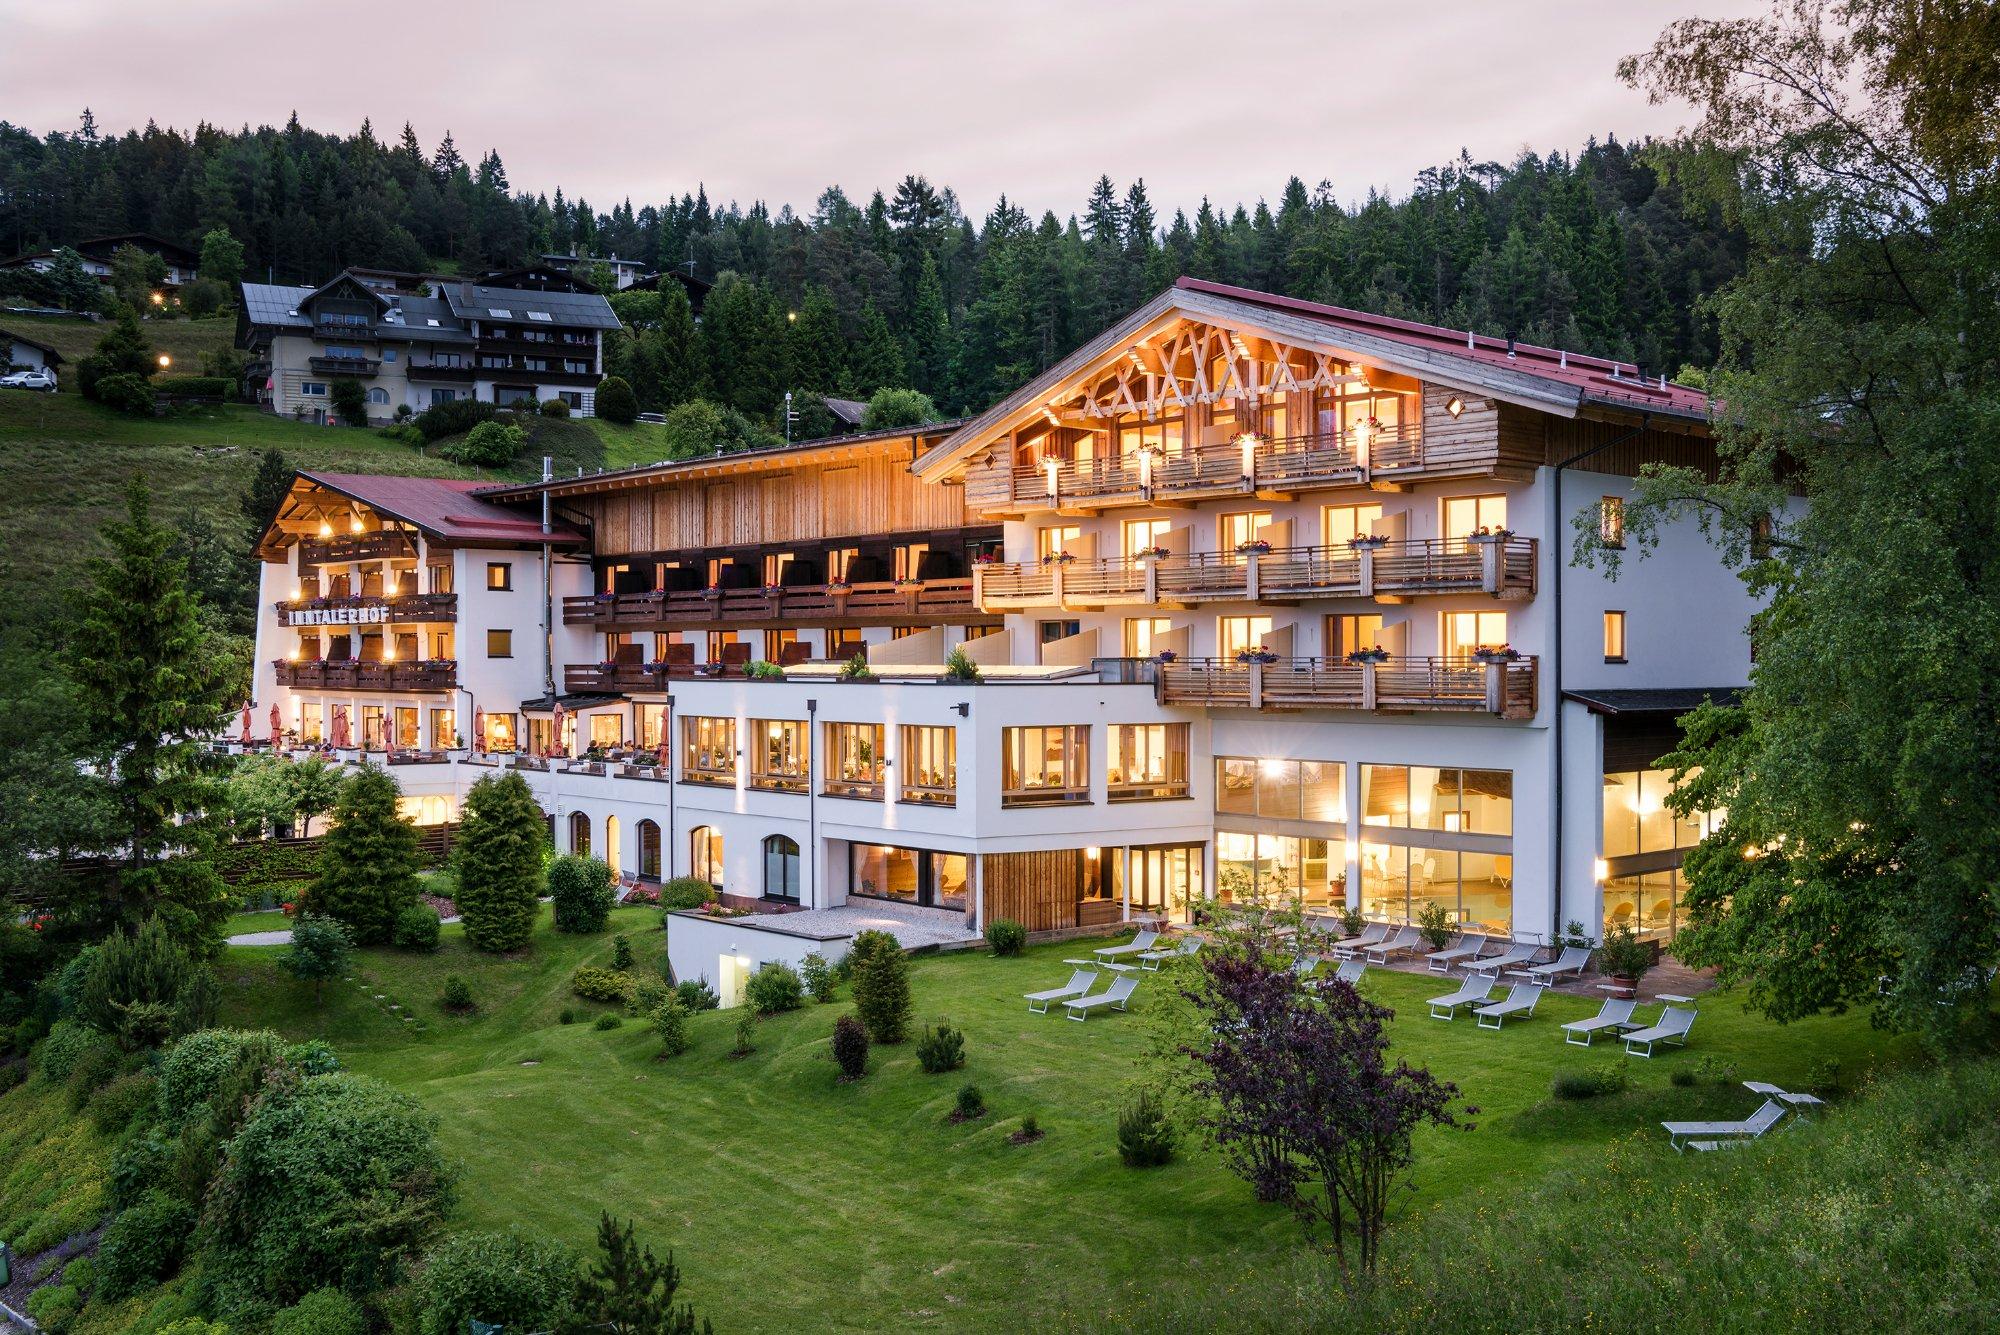 Hotel Inntalerhof